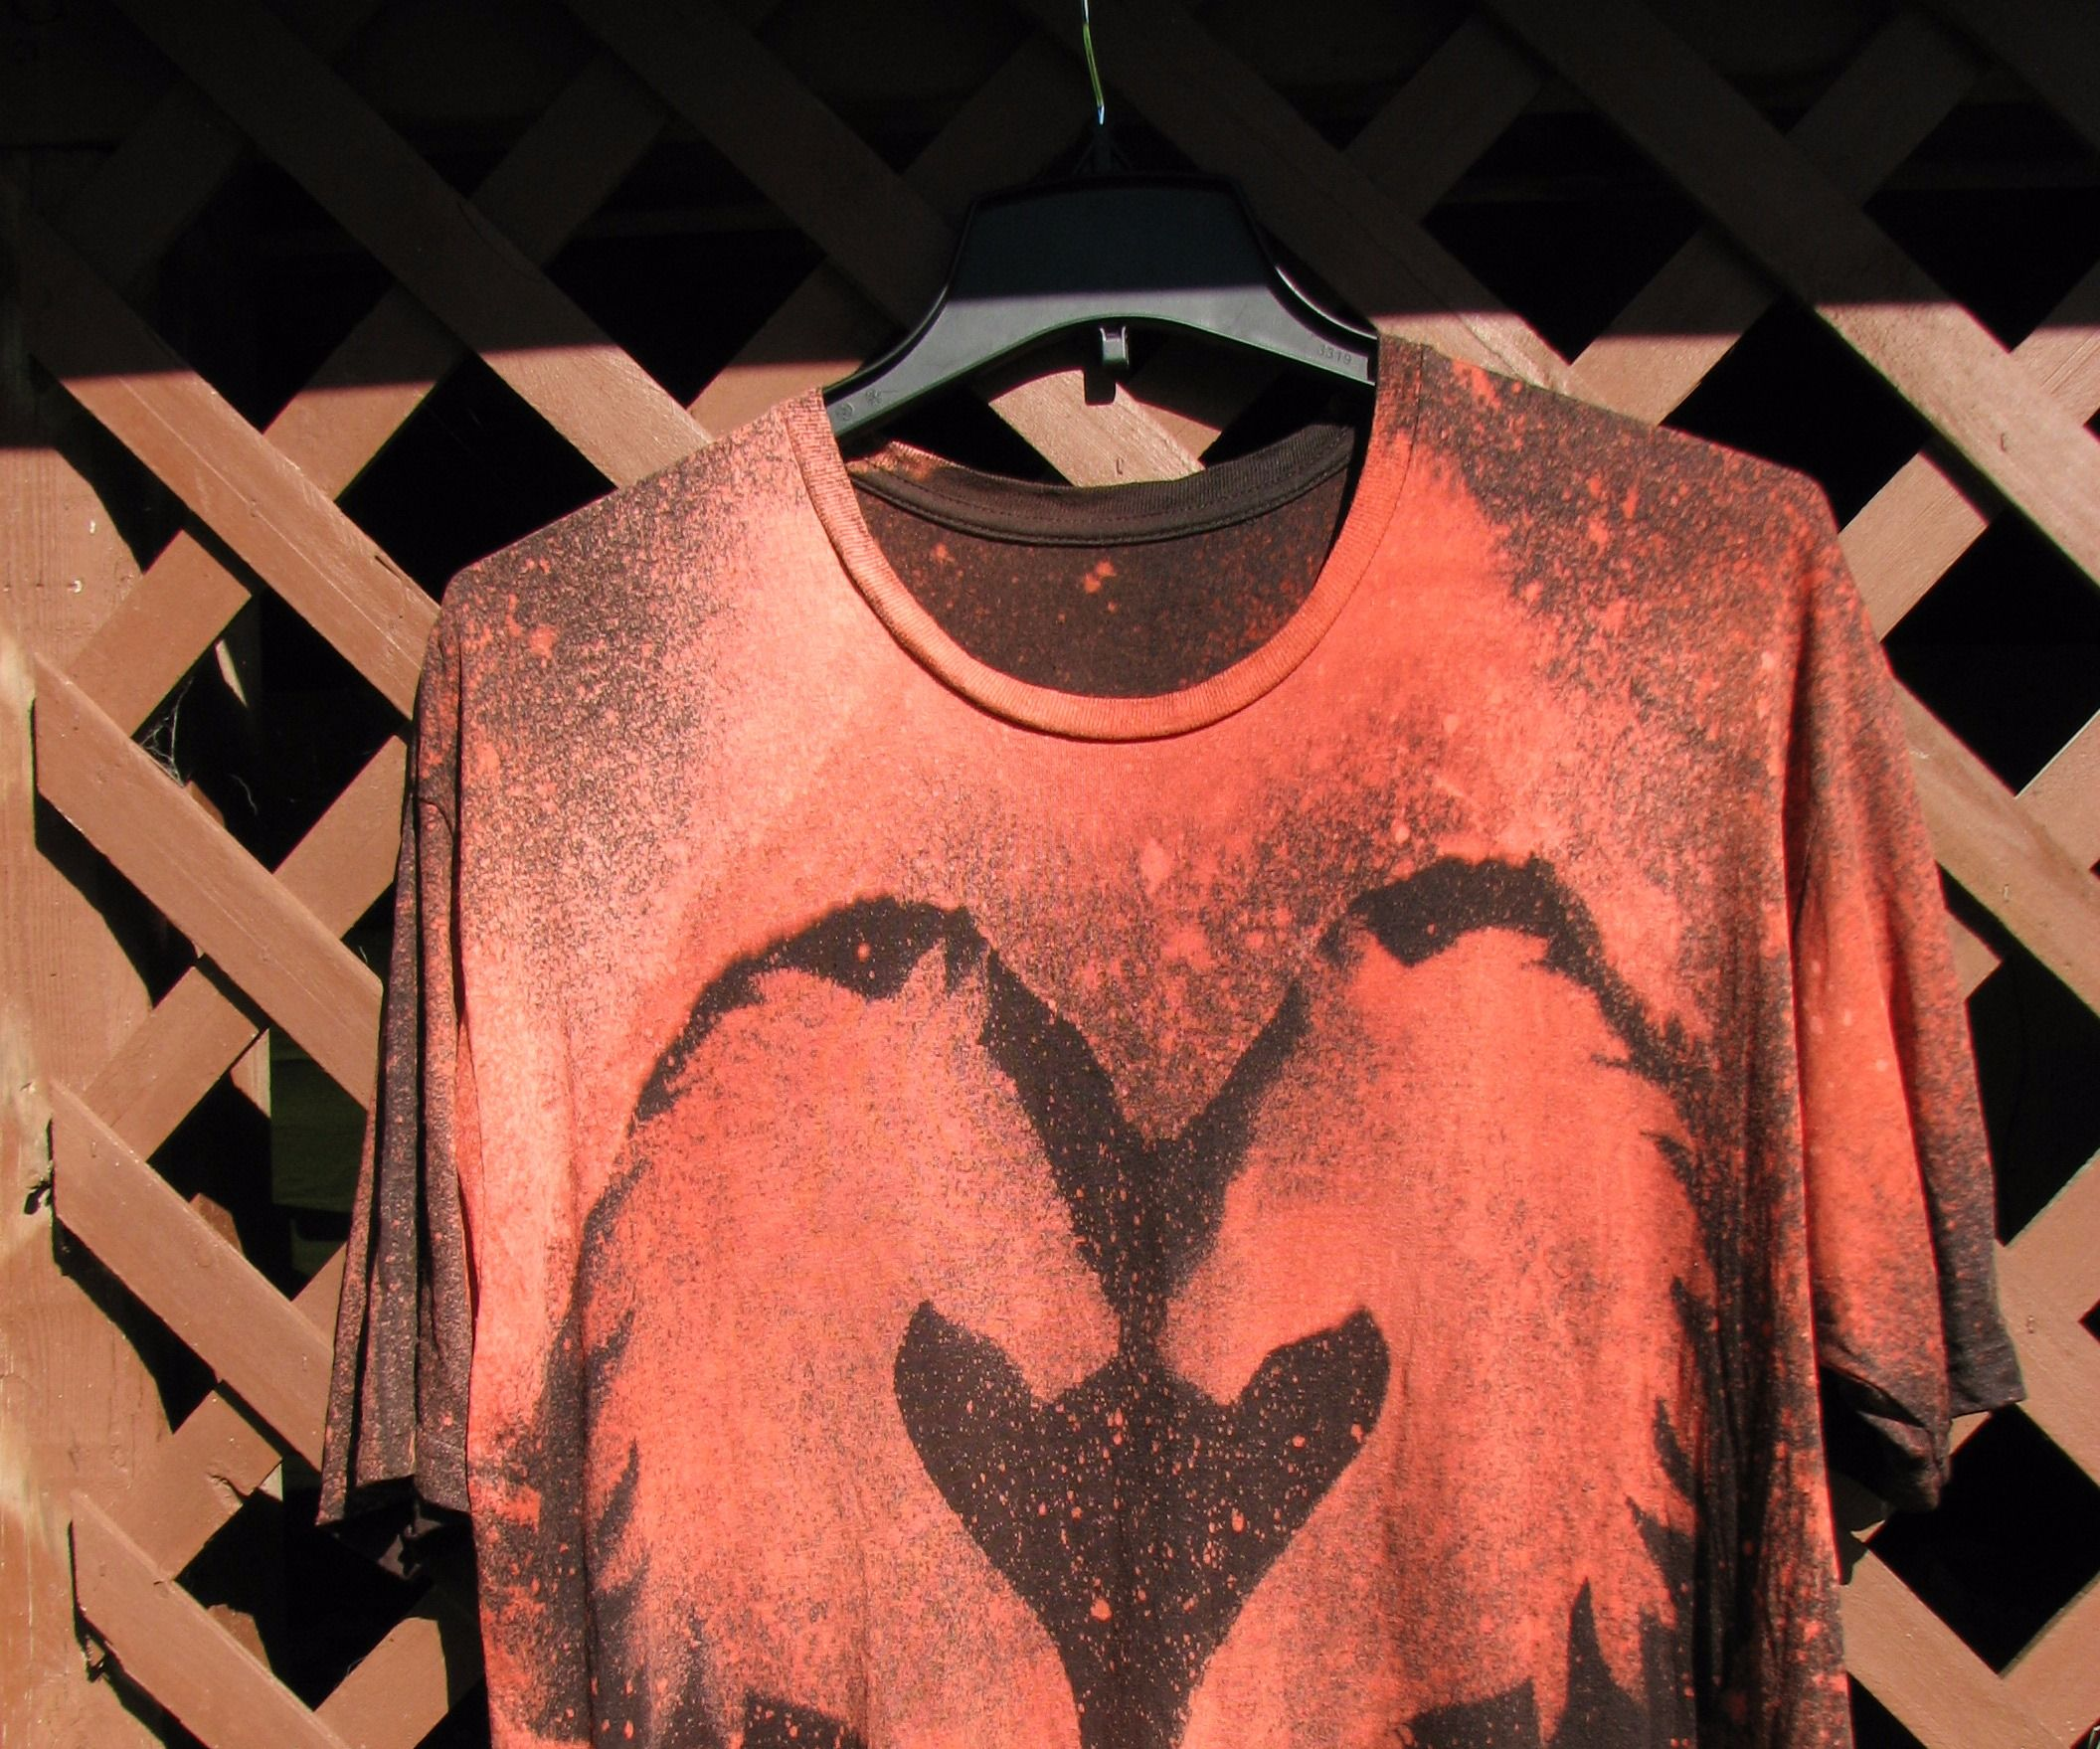 How to Custom Design a T-Shirt With Bleach